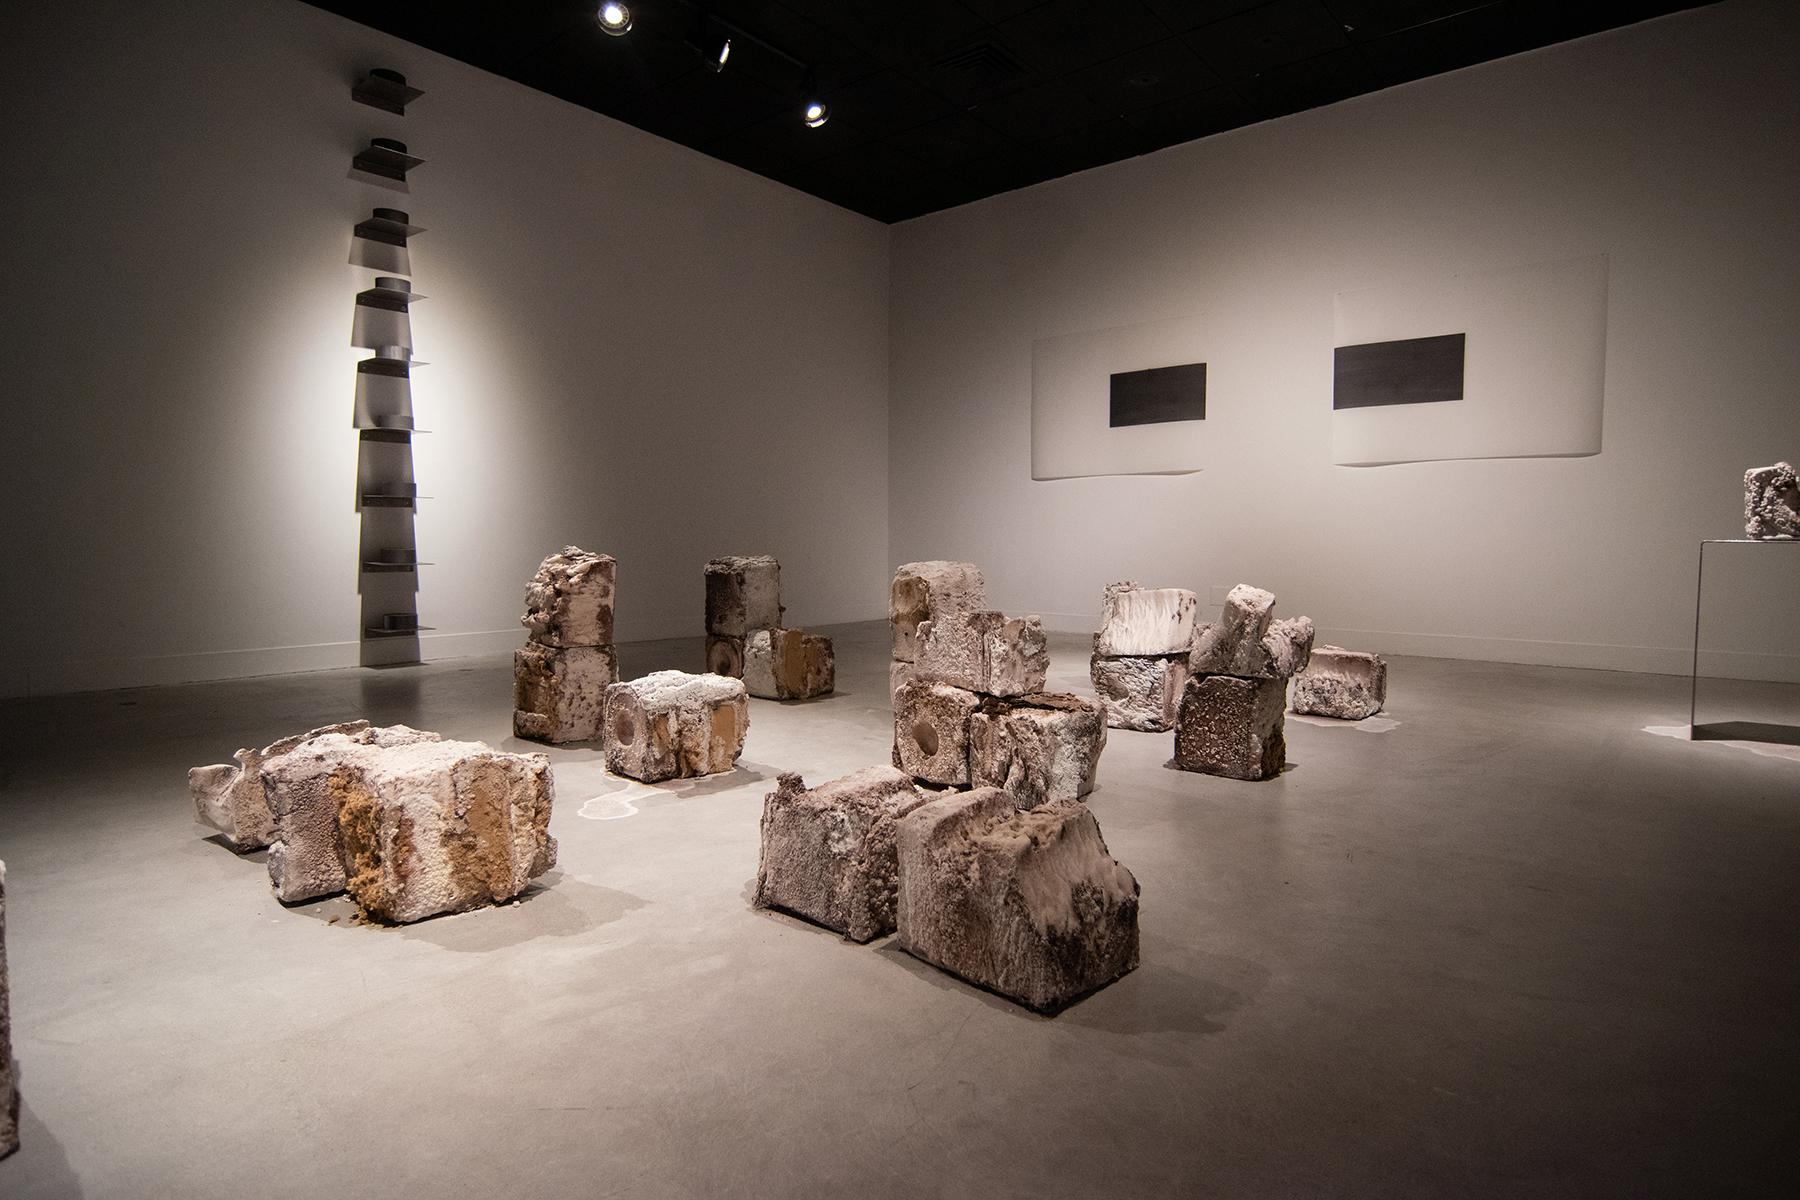 Colour Maisch & Gary Vlasic exhibition at Utah Museum of Contemporary Art, September 2020